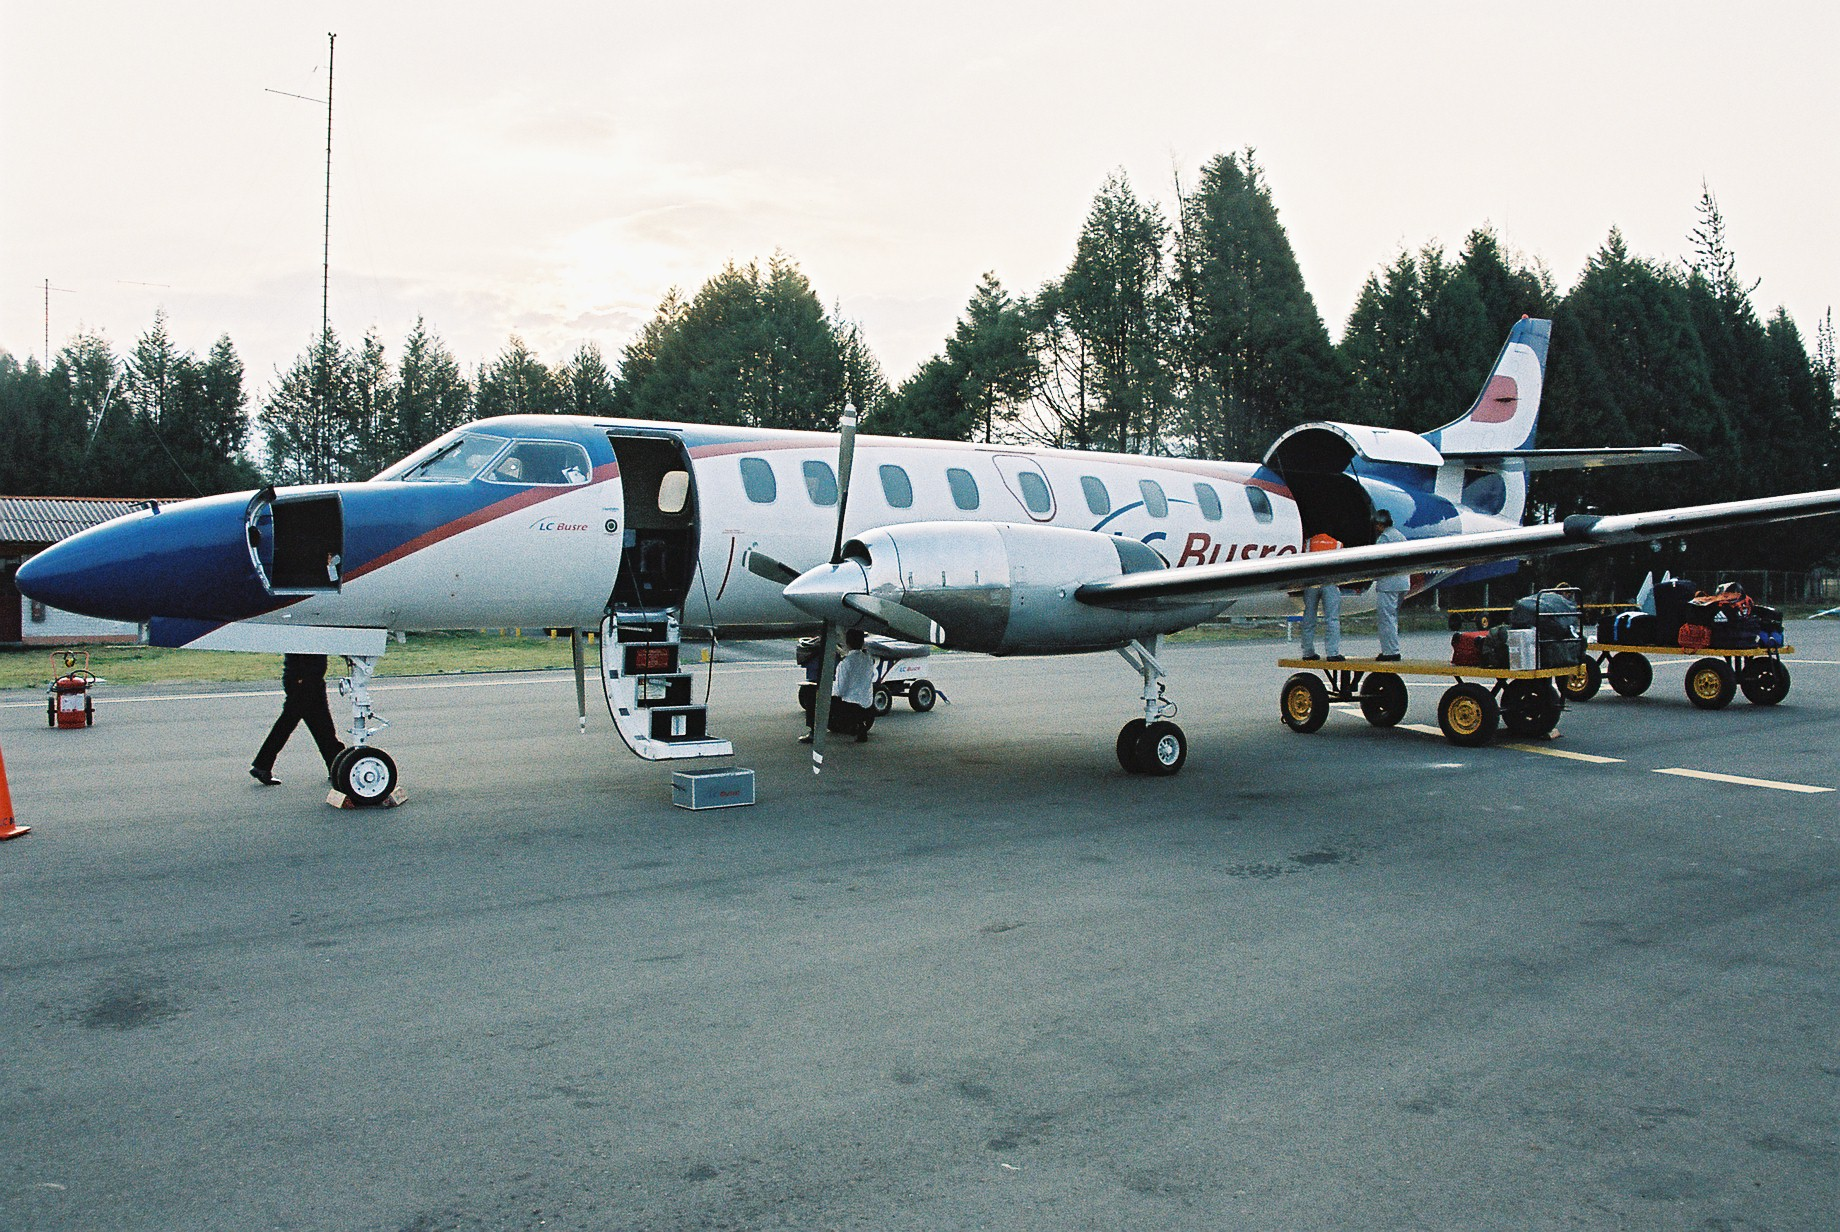 Trans-Colorado Airlines Flight 2286 - Wikipedia